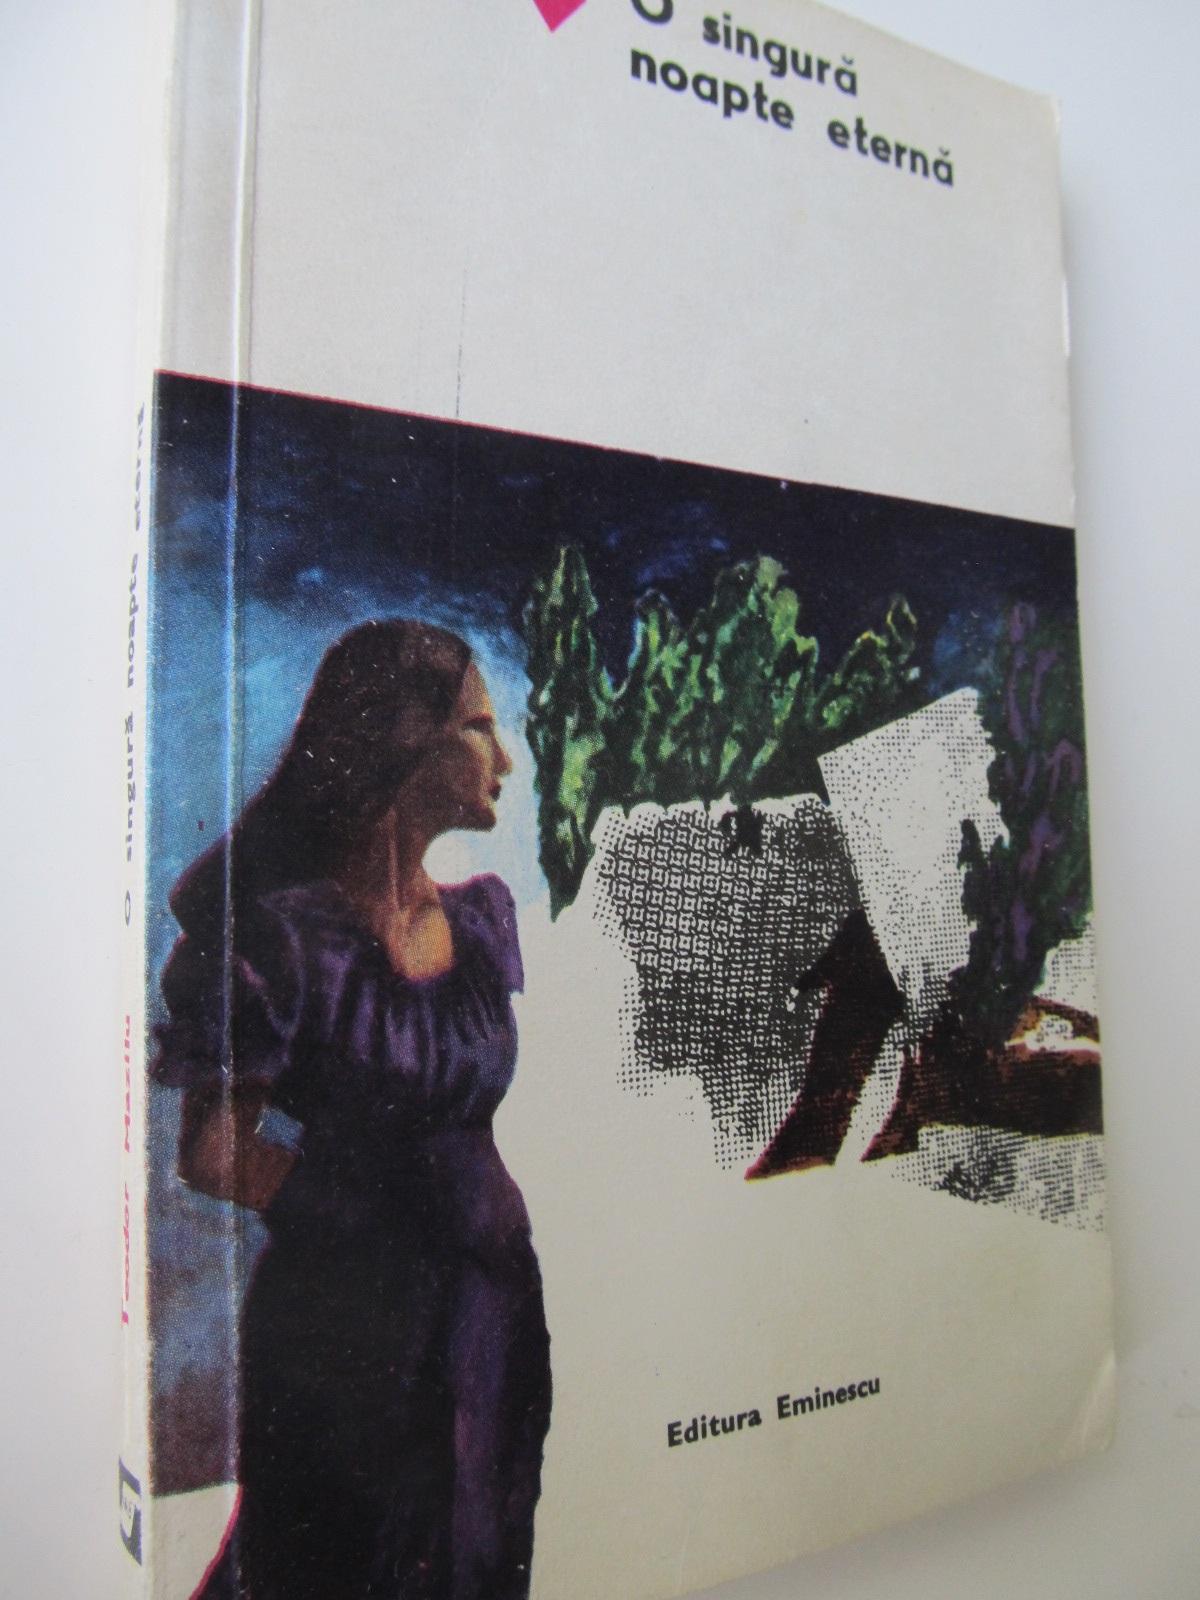 O singura noapte eterna - Teodor Mazilu | Detalii carte